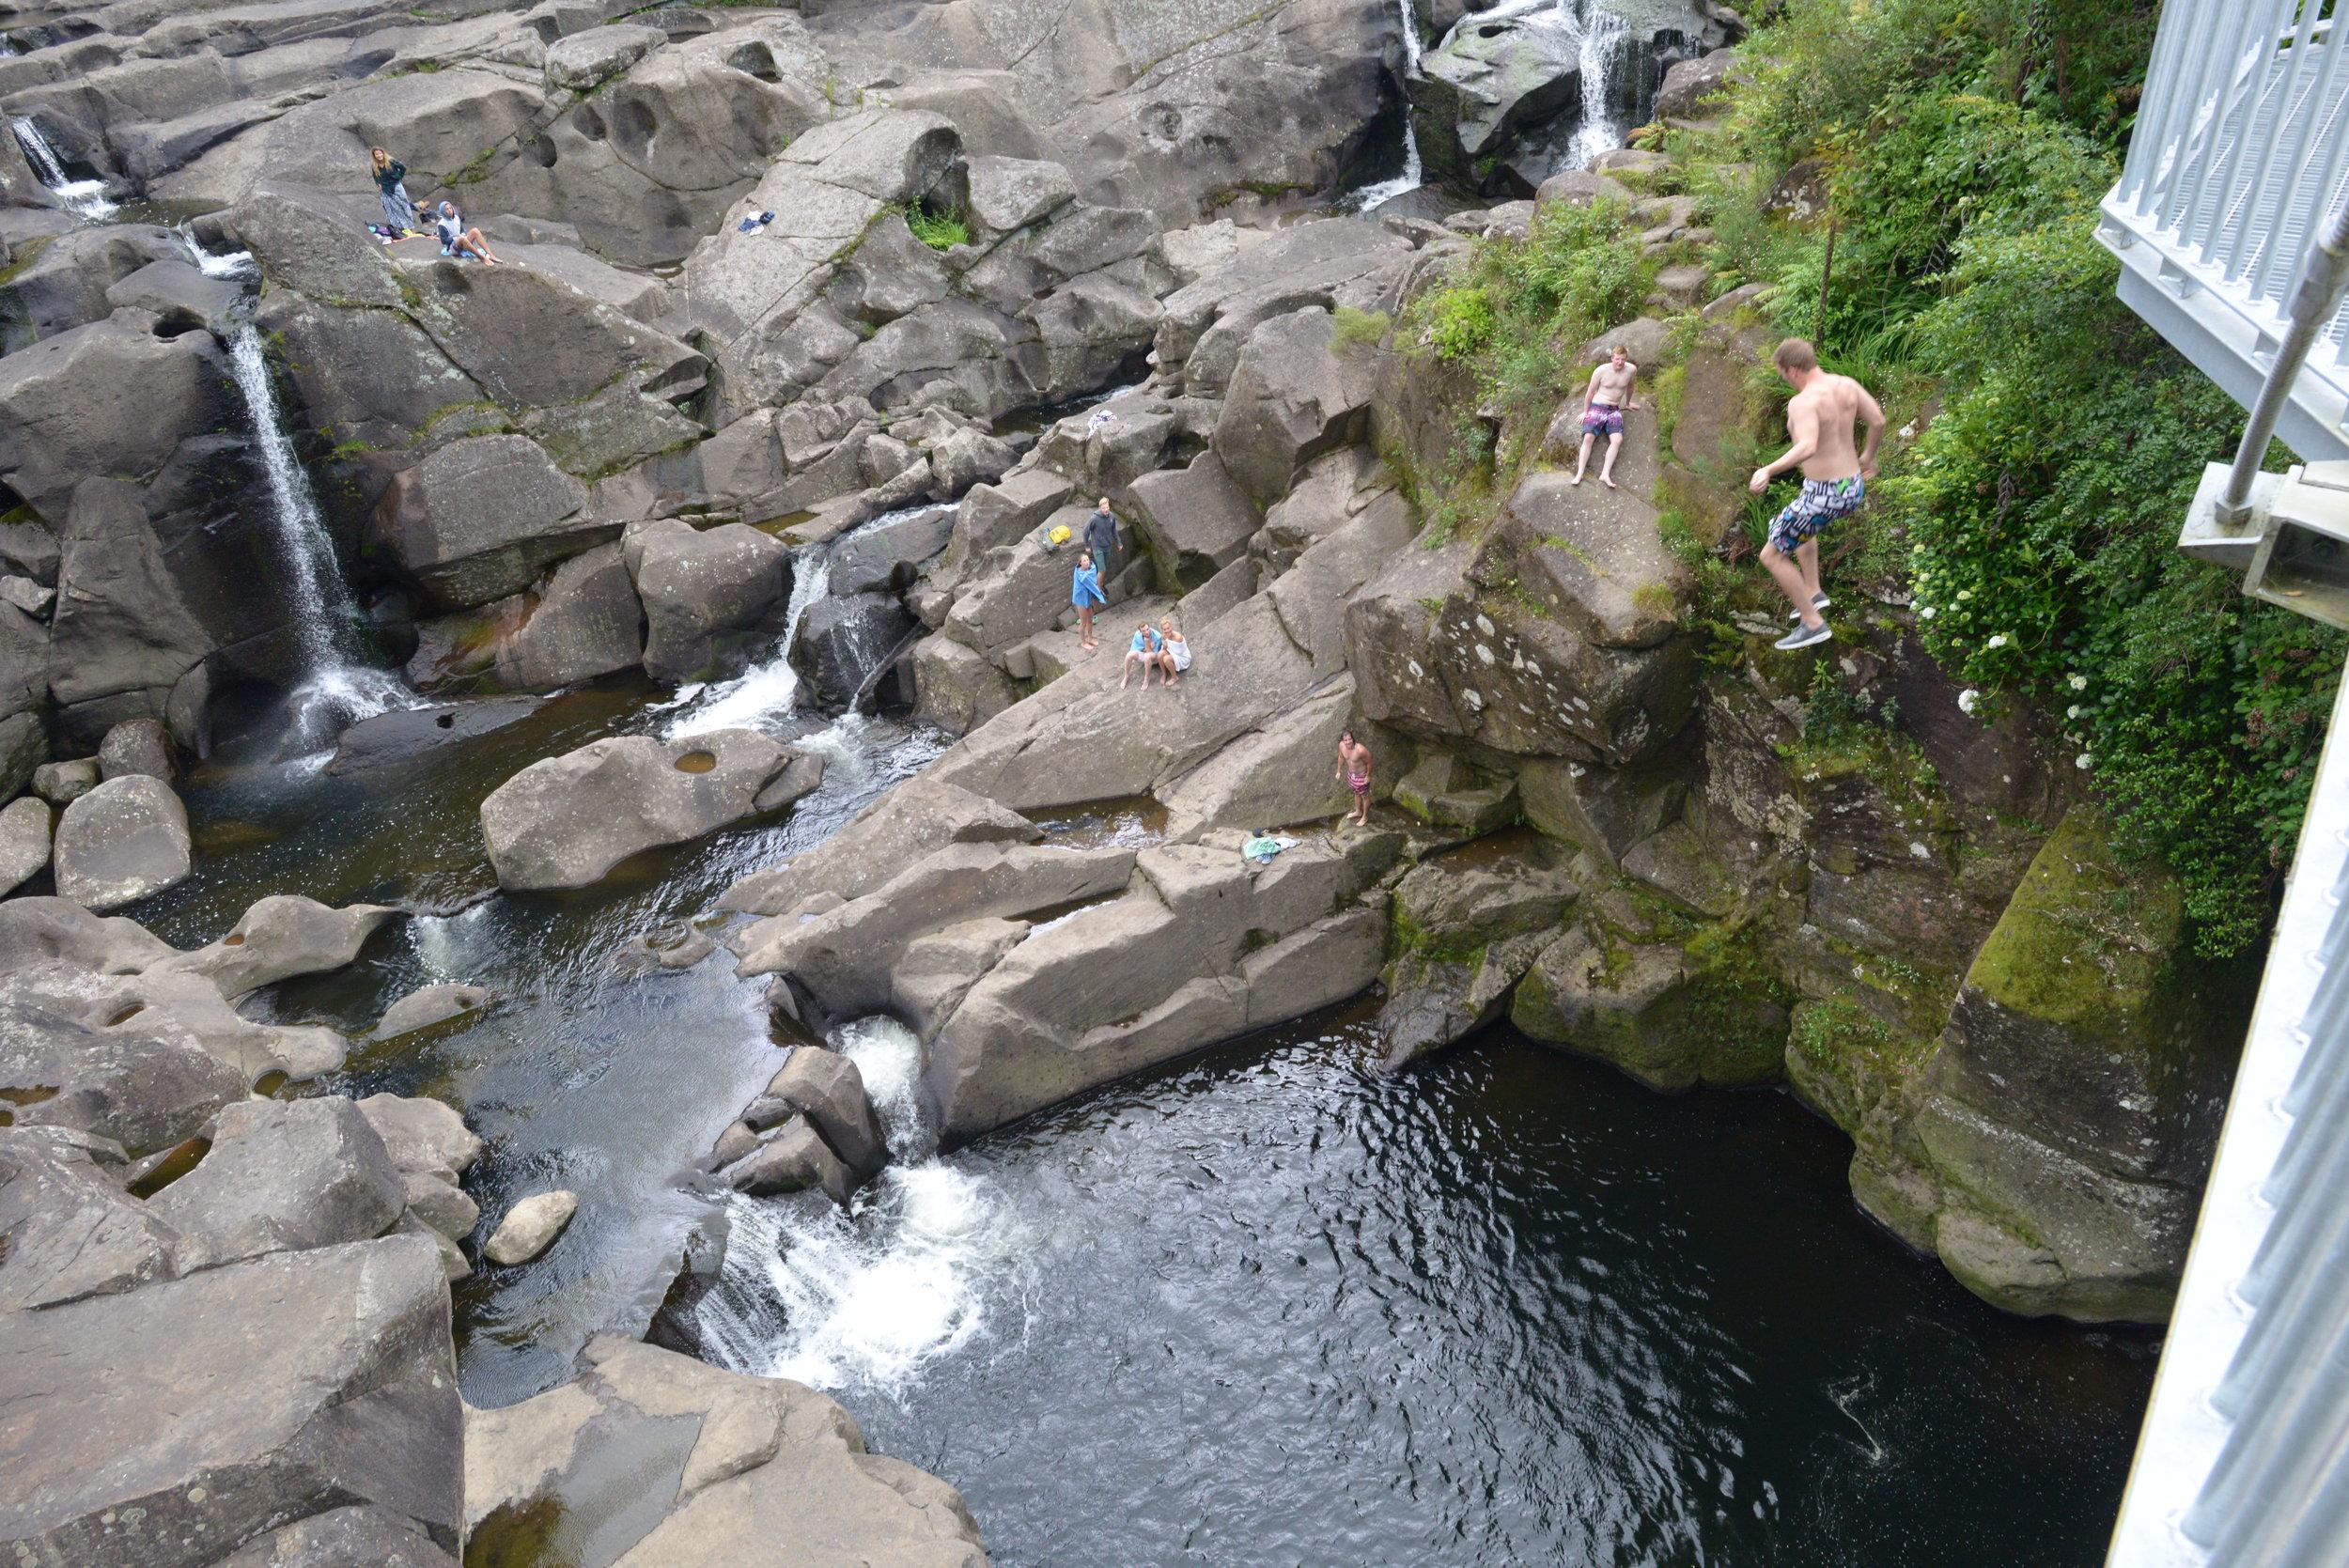 Woohoo! Teens jumping off the bridge (actually not allowed) into Maclaren Falls.